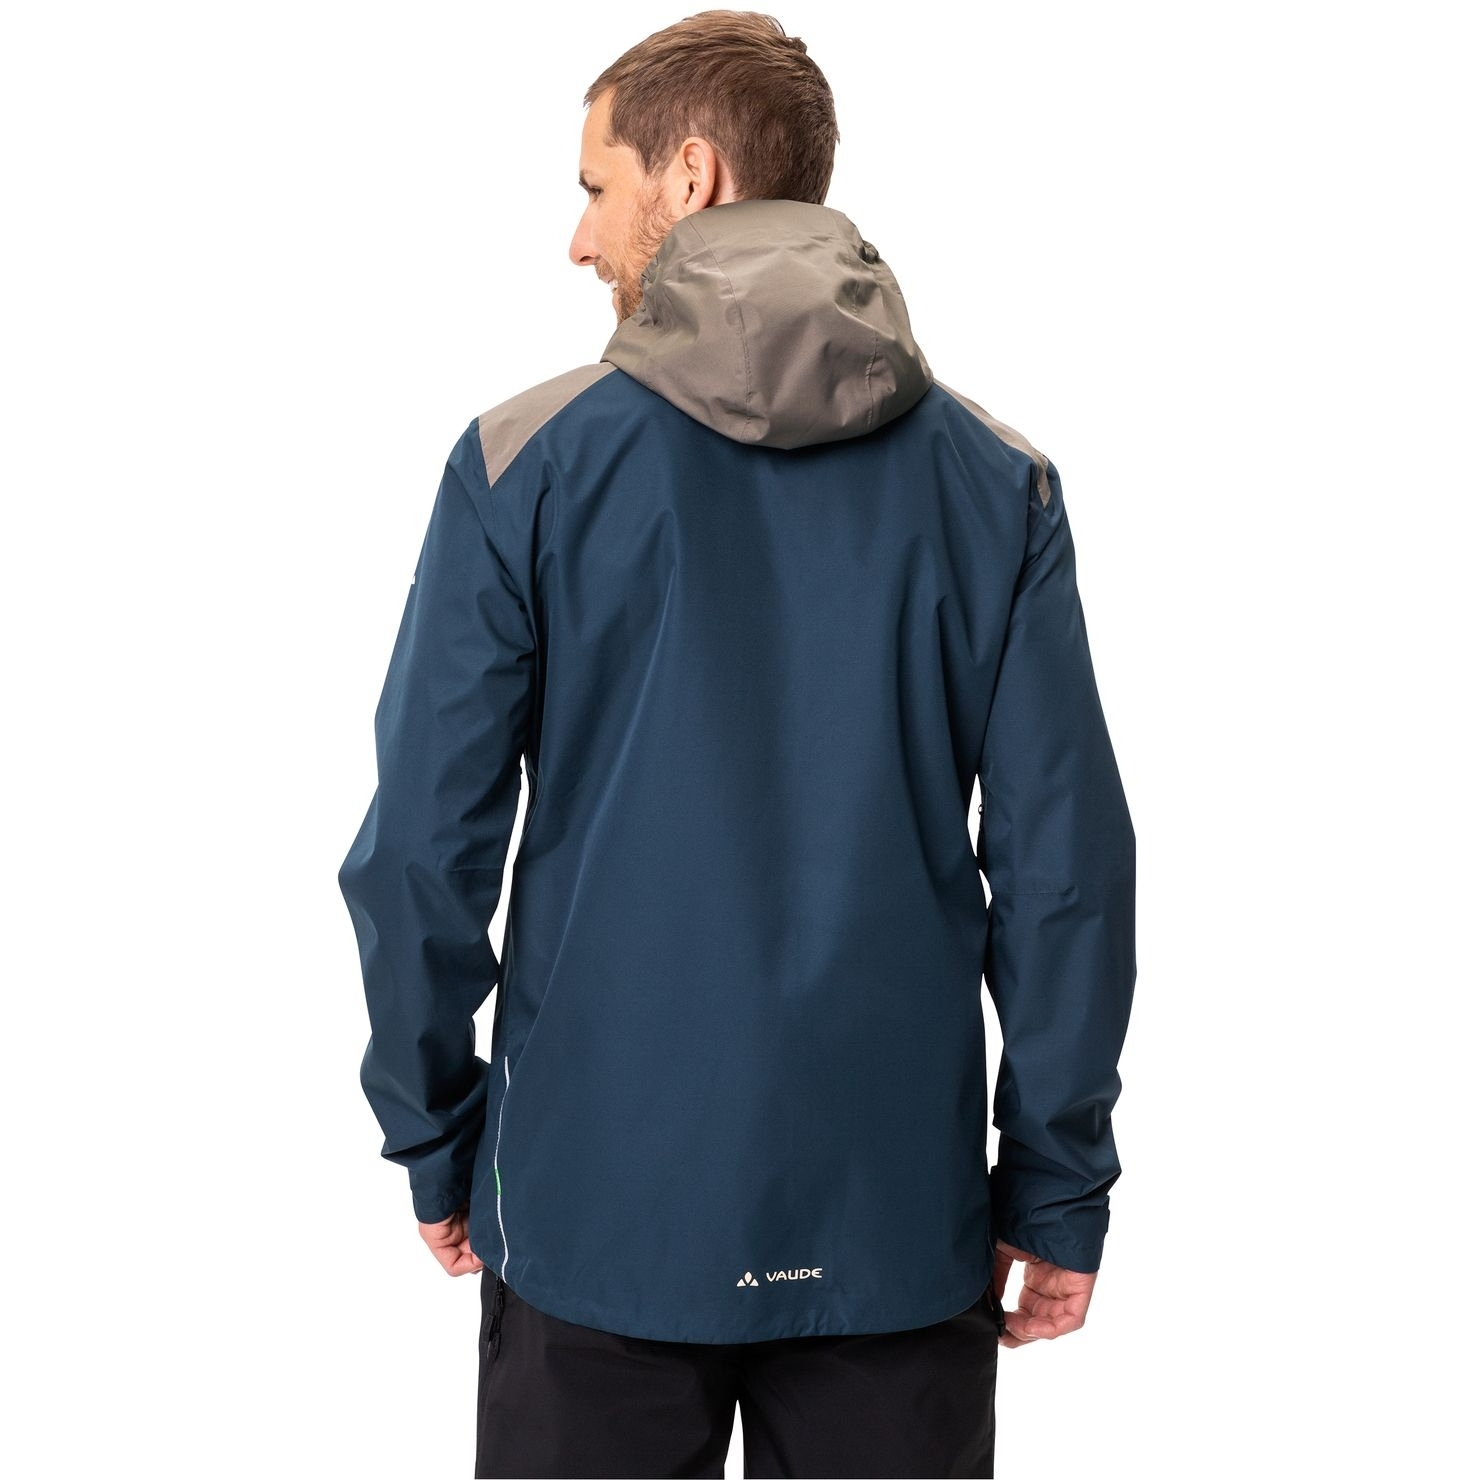 Image of Vaude Men's All Year Moab 3in1 Rain Jacket - dark sea